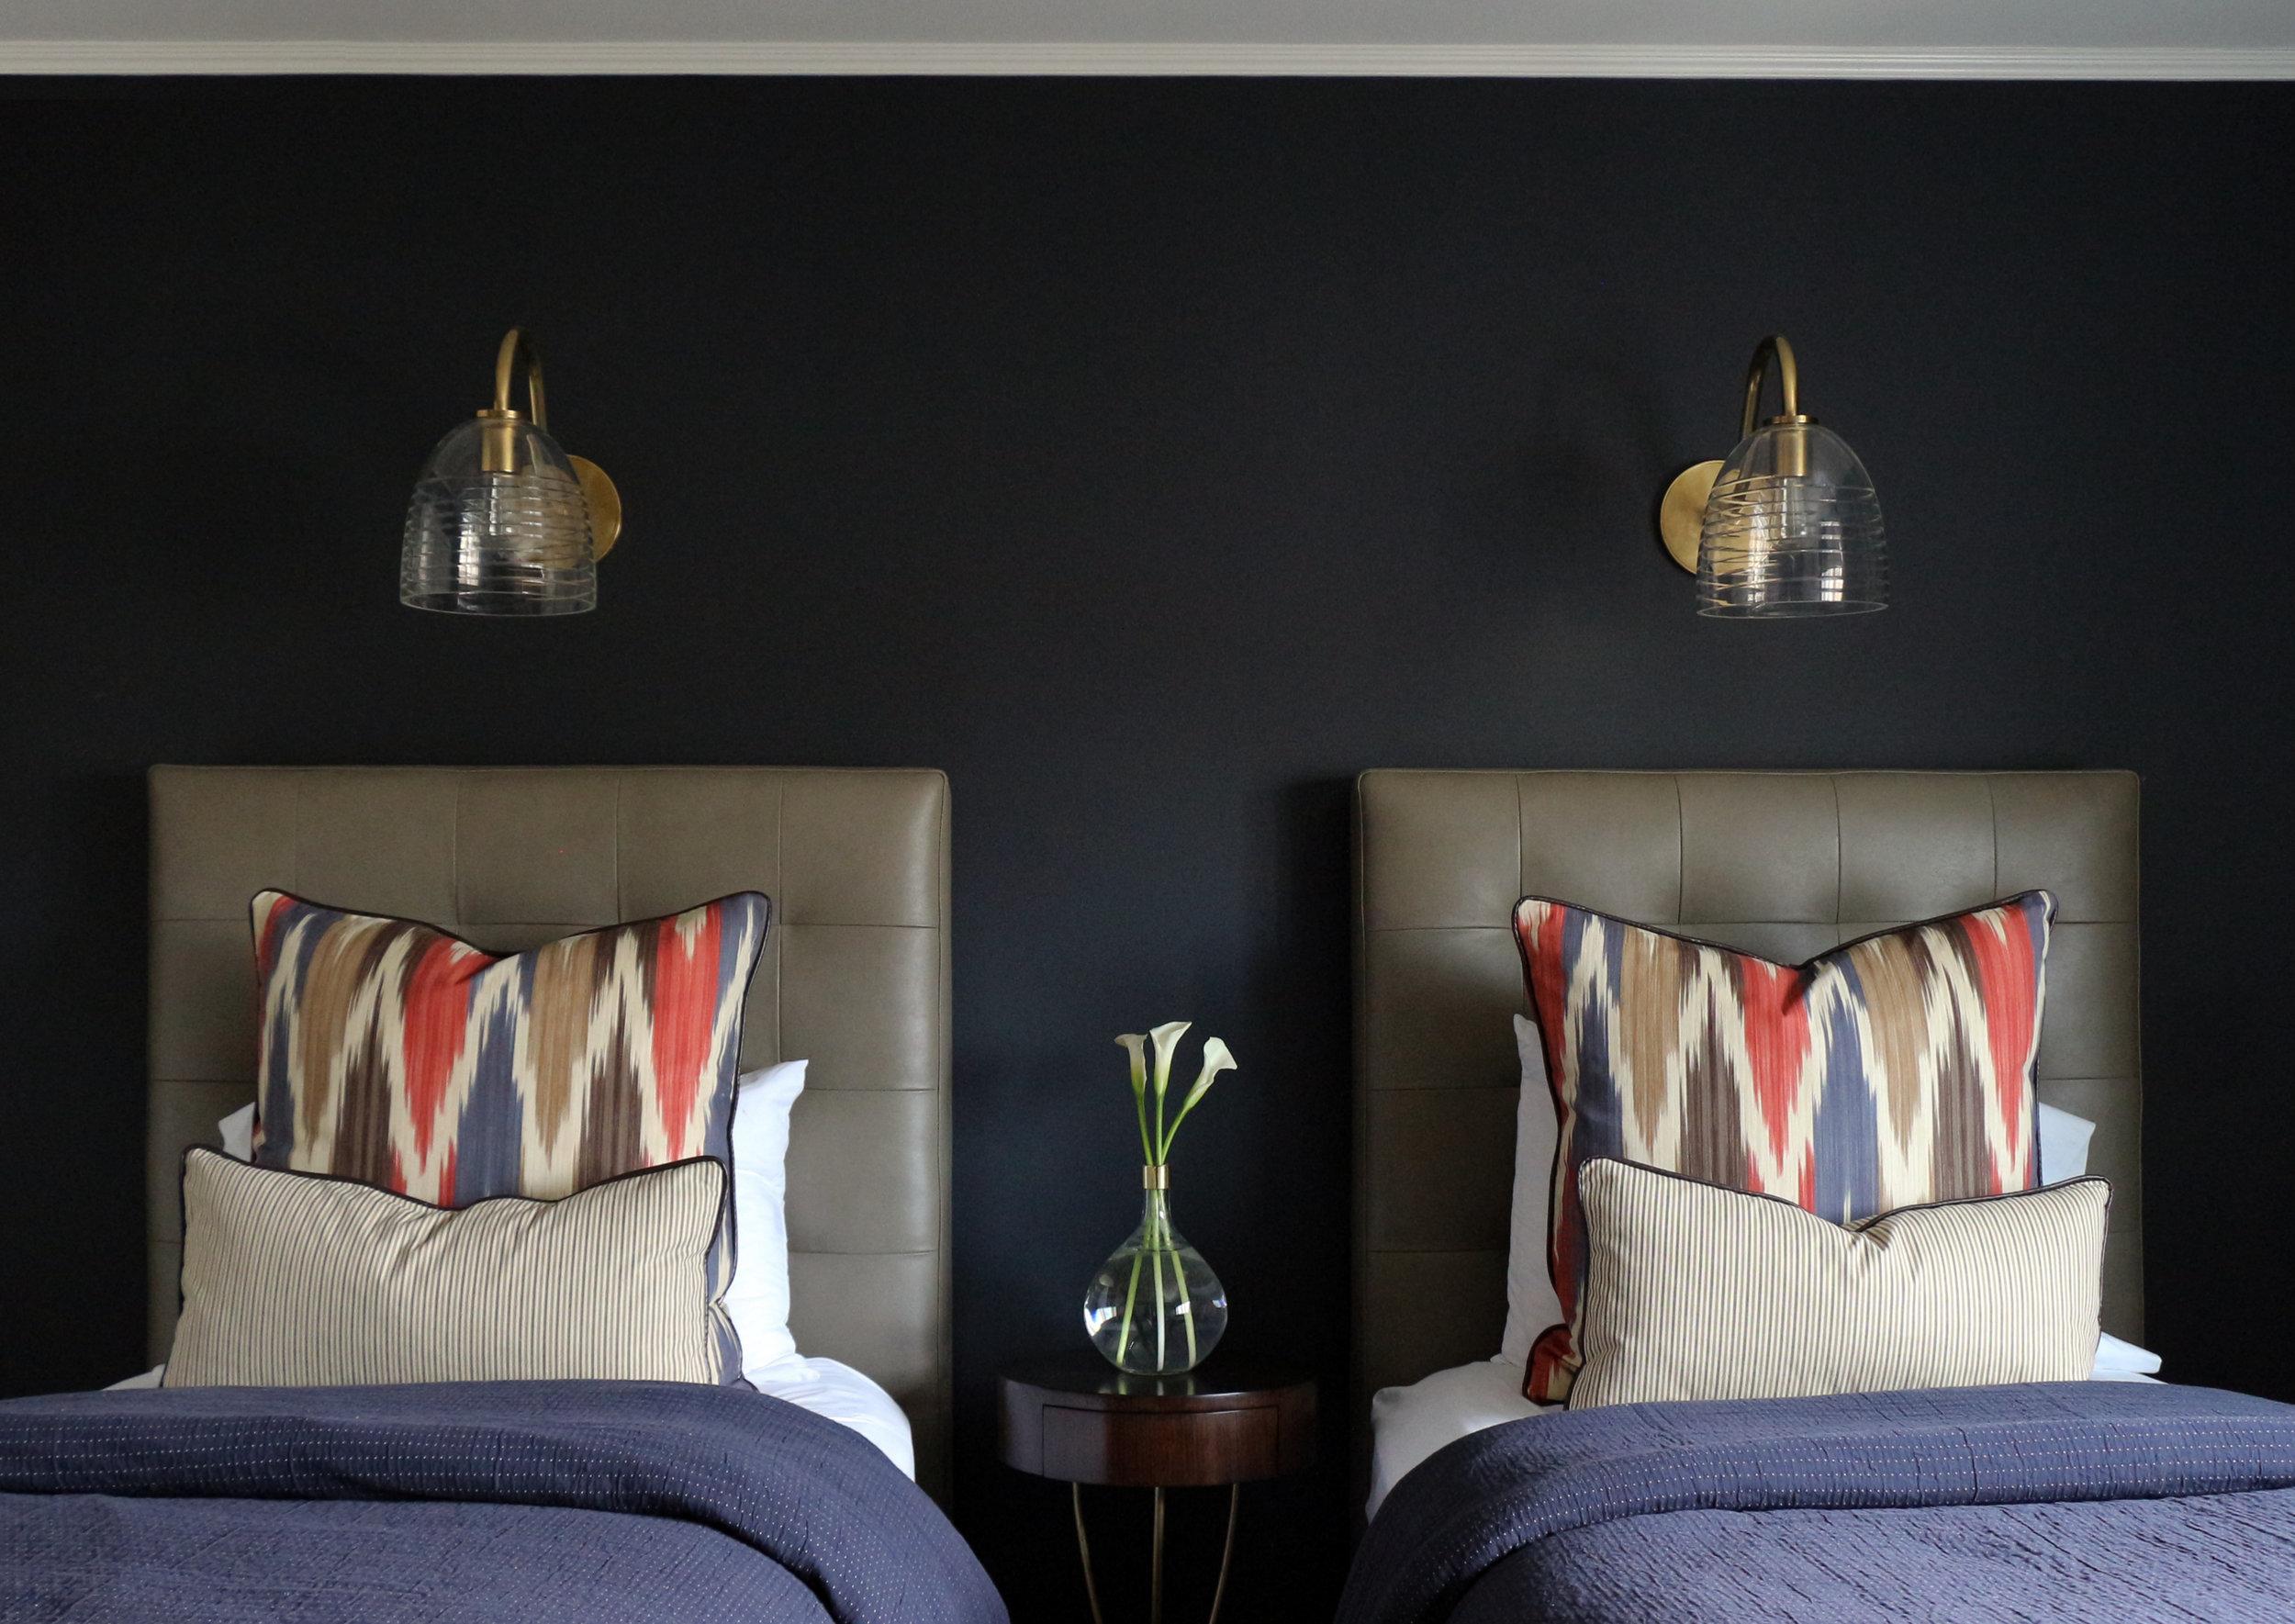 Bedrooms 3 Los Angeles Interior Designer.jpg